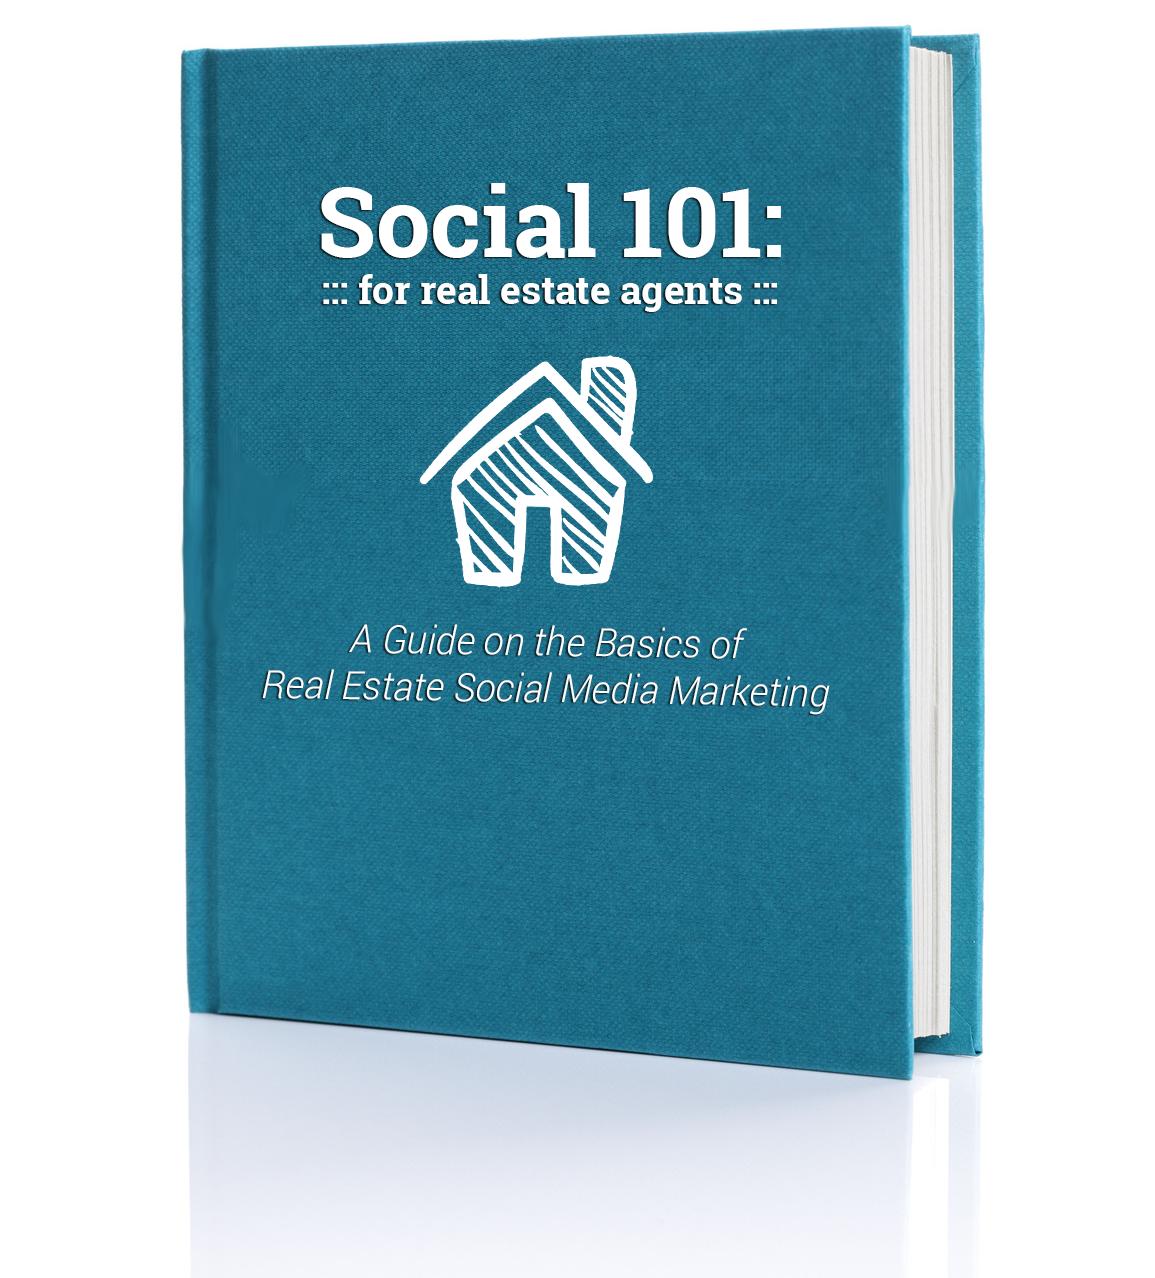 Social-101-3.png